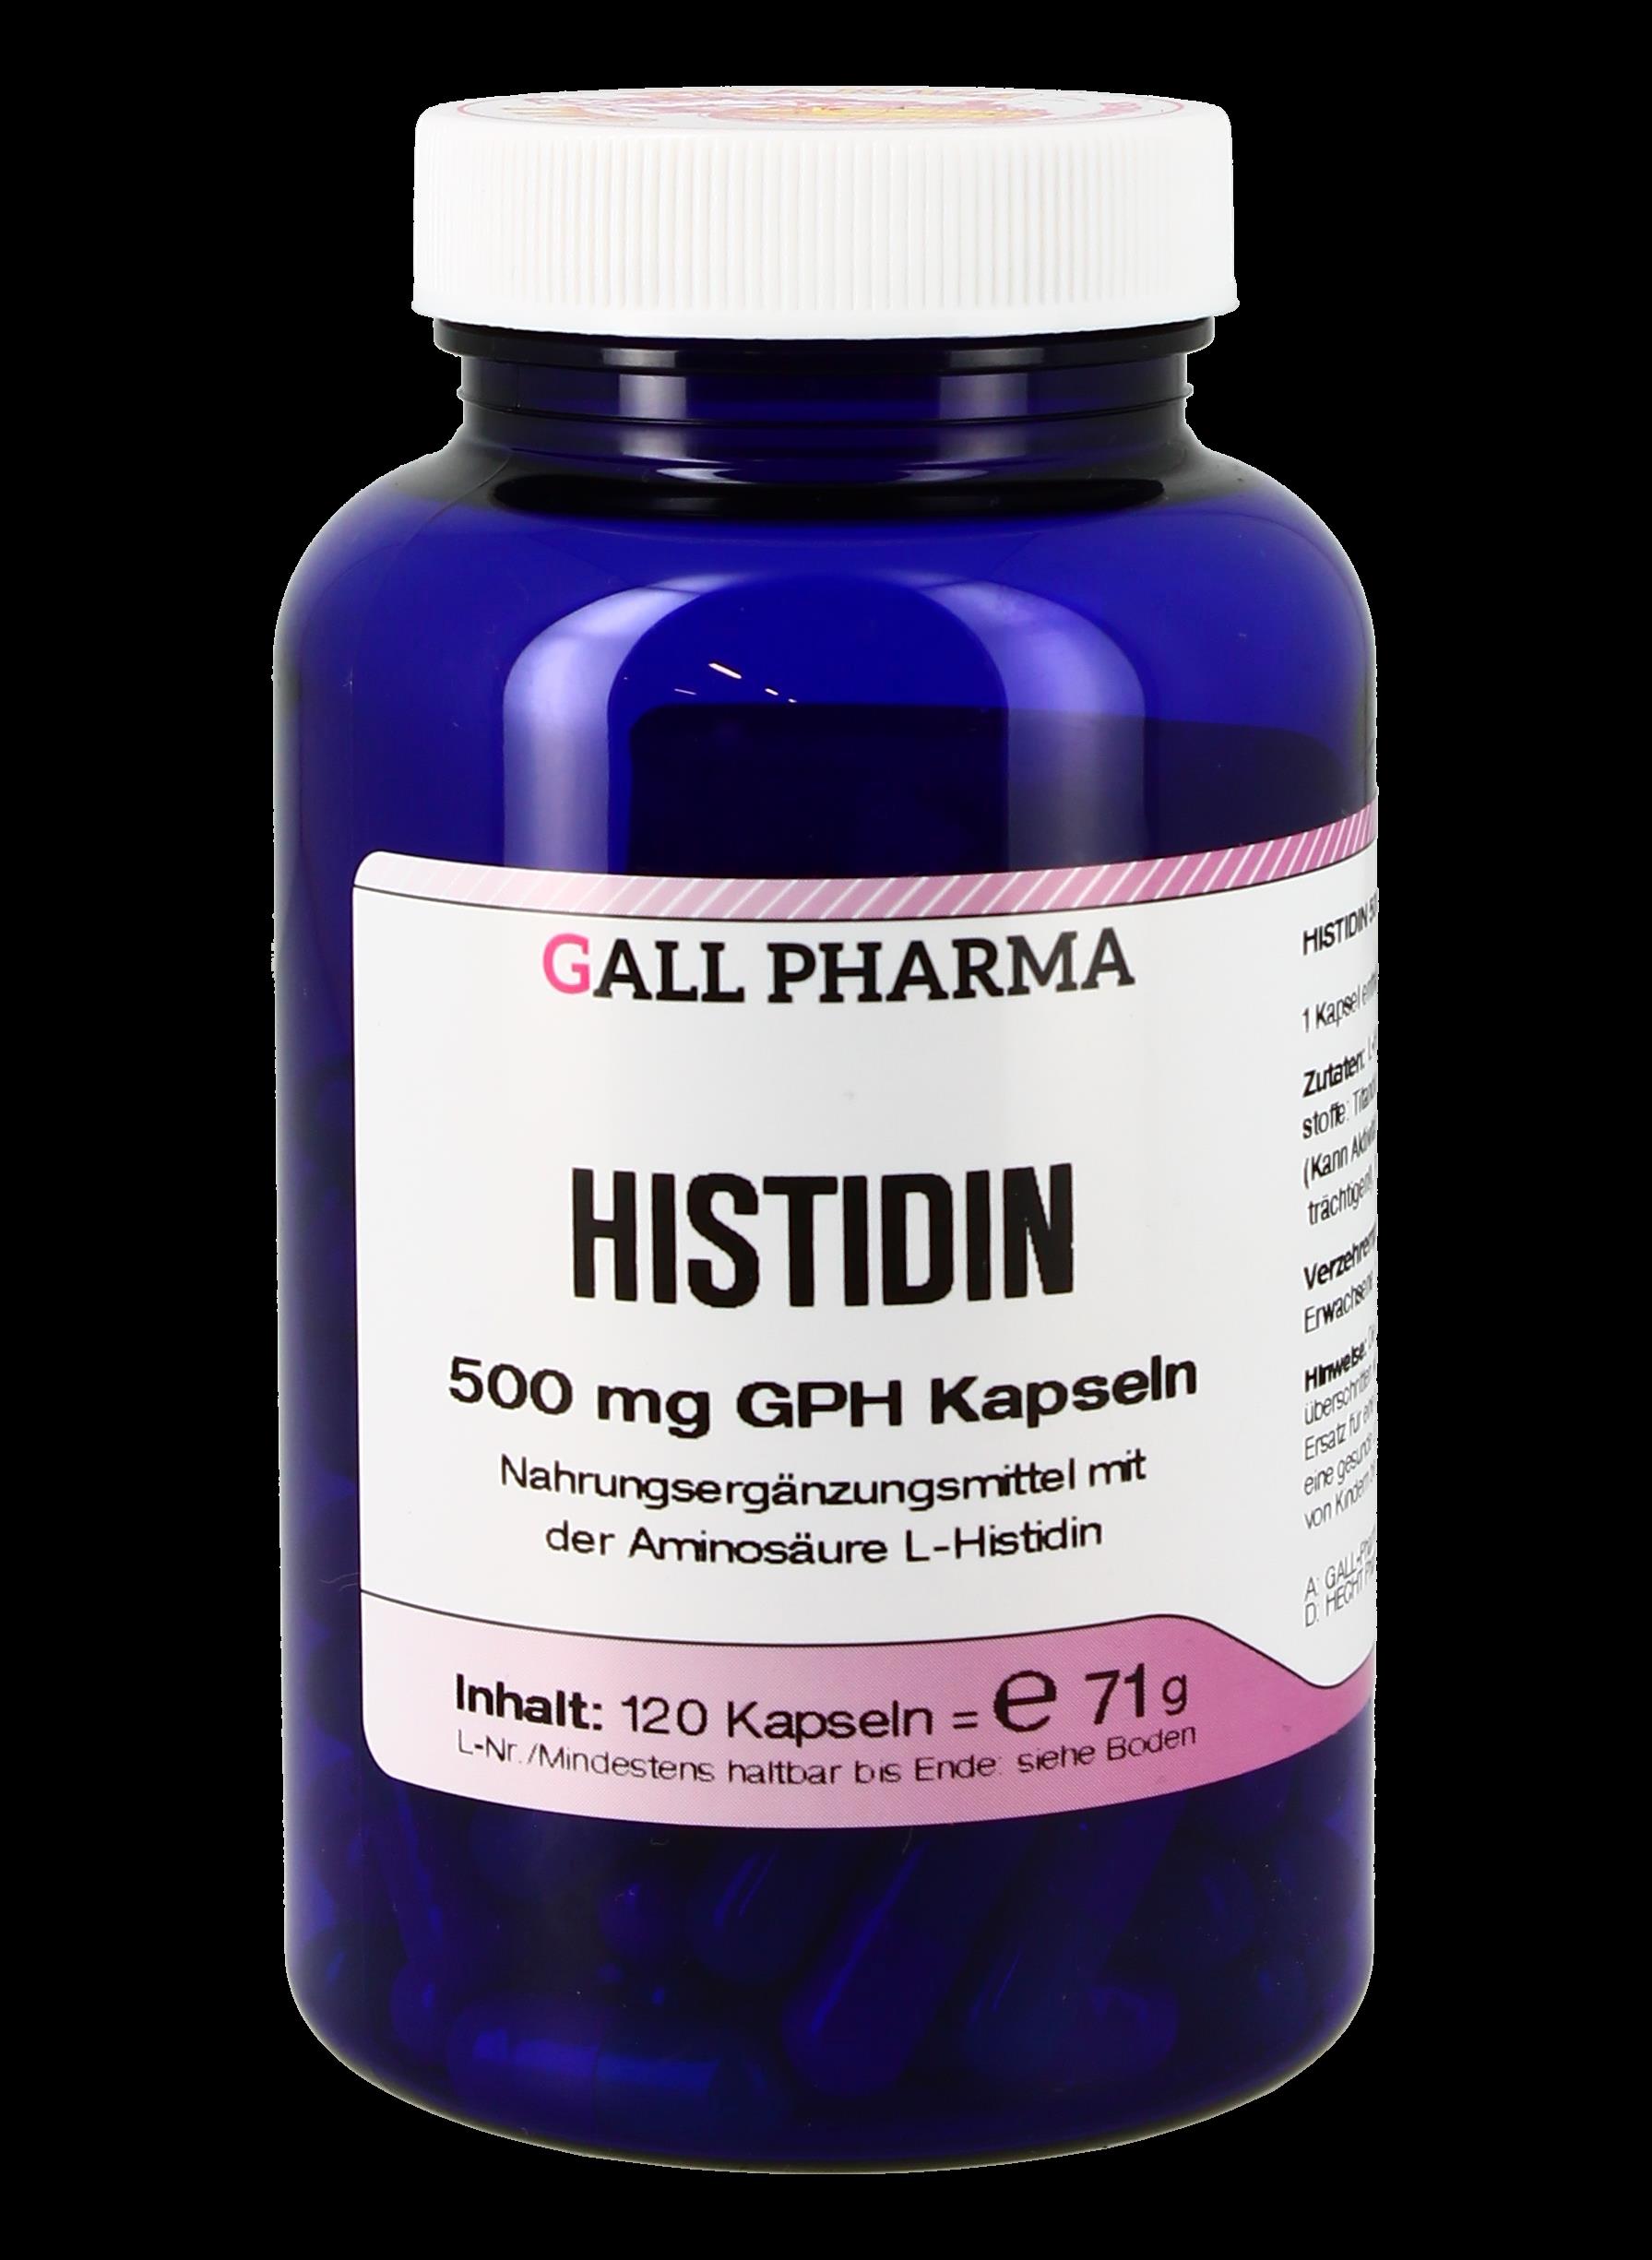 Histidin 500 mg GPH Kapseln